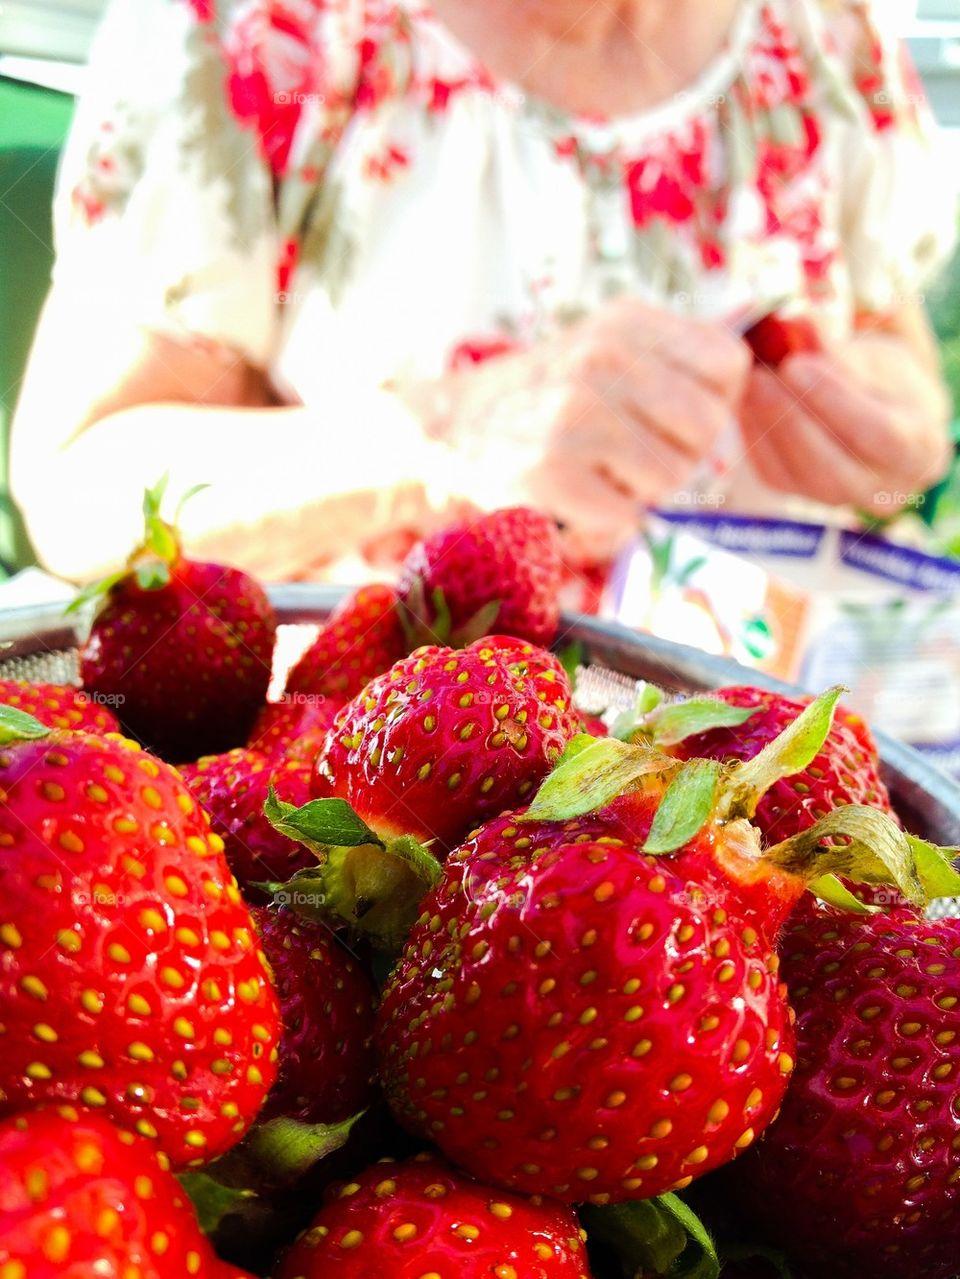 Strawberry lover. Strawberries